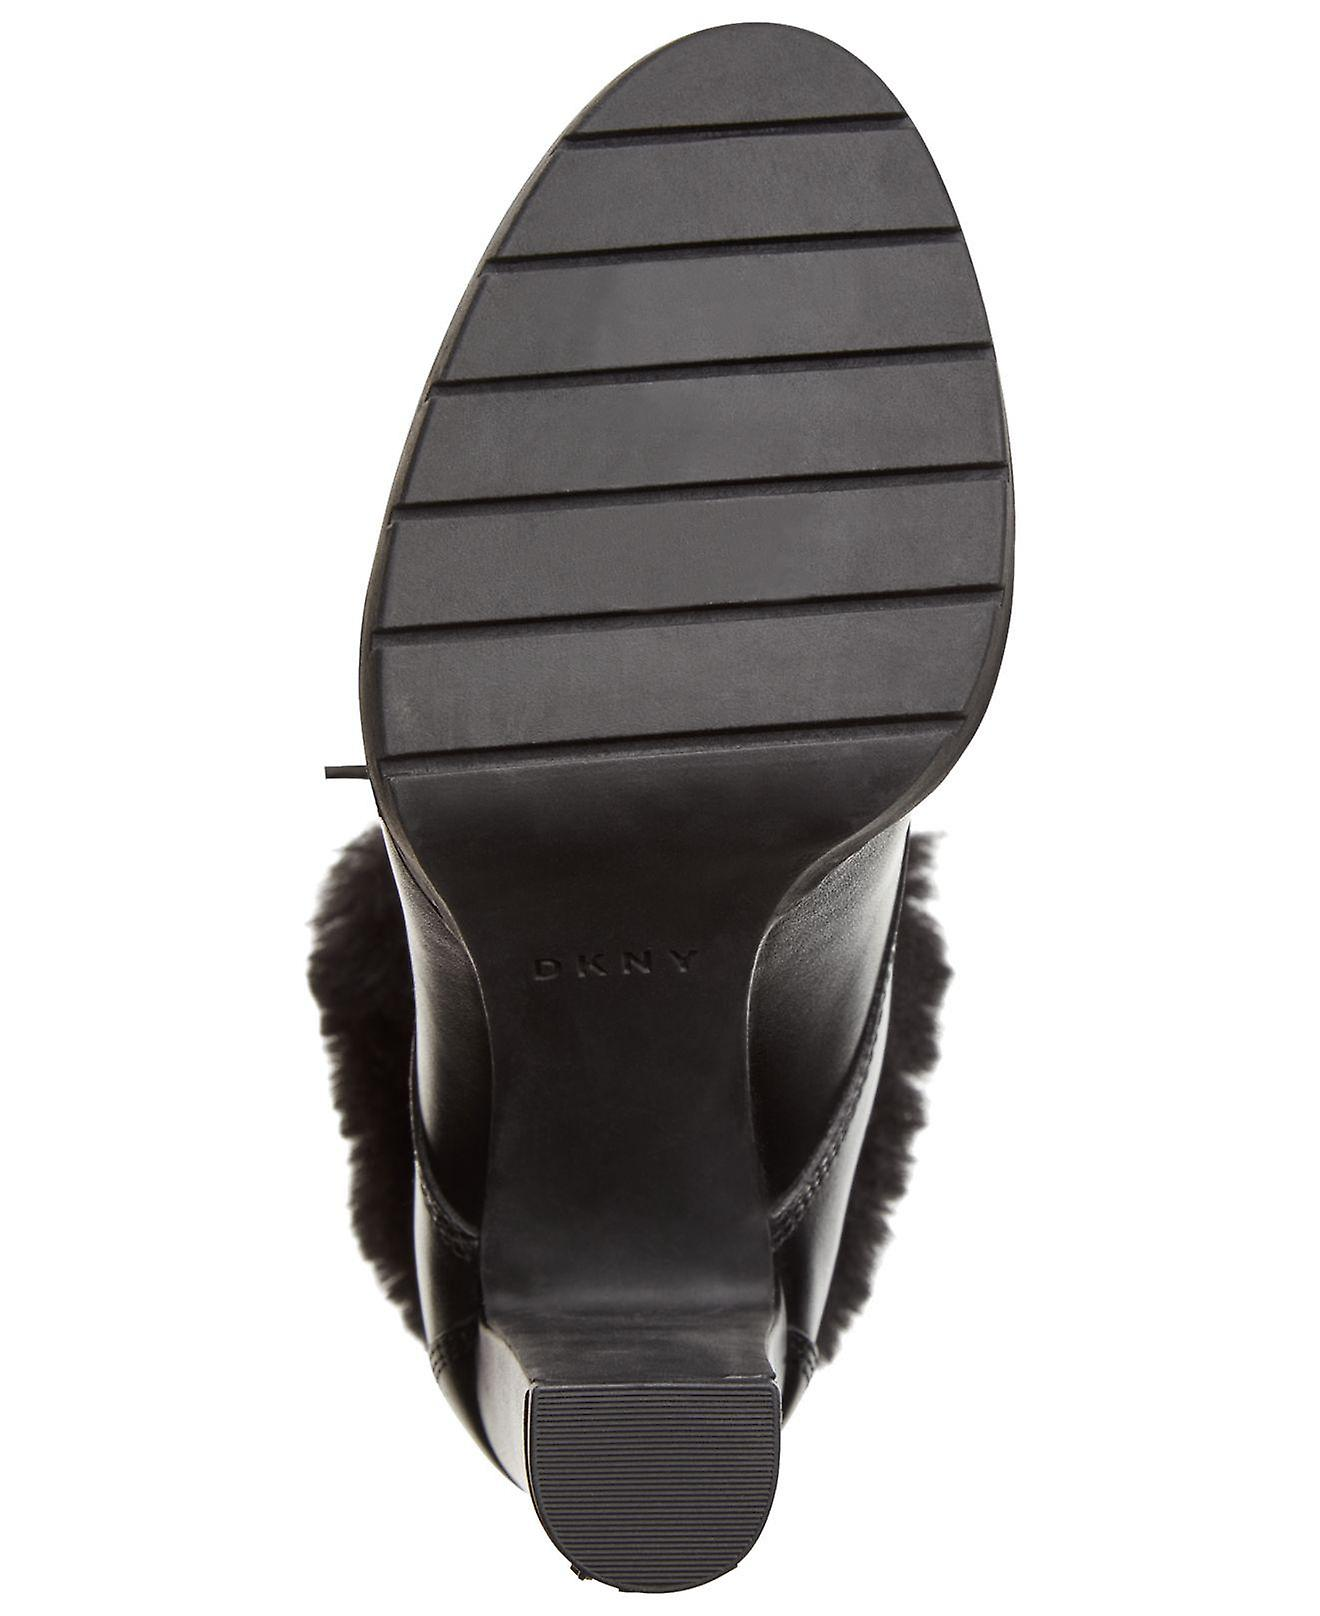 DKNY Kobiety Darcy koronki zamknięte toe Mid-Calf Cold Weather Boots QyPQ3